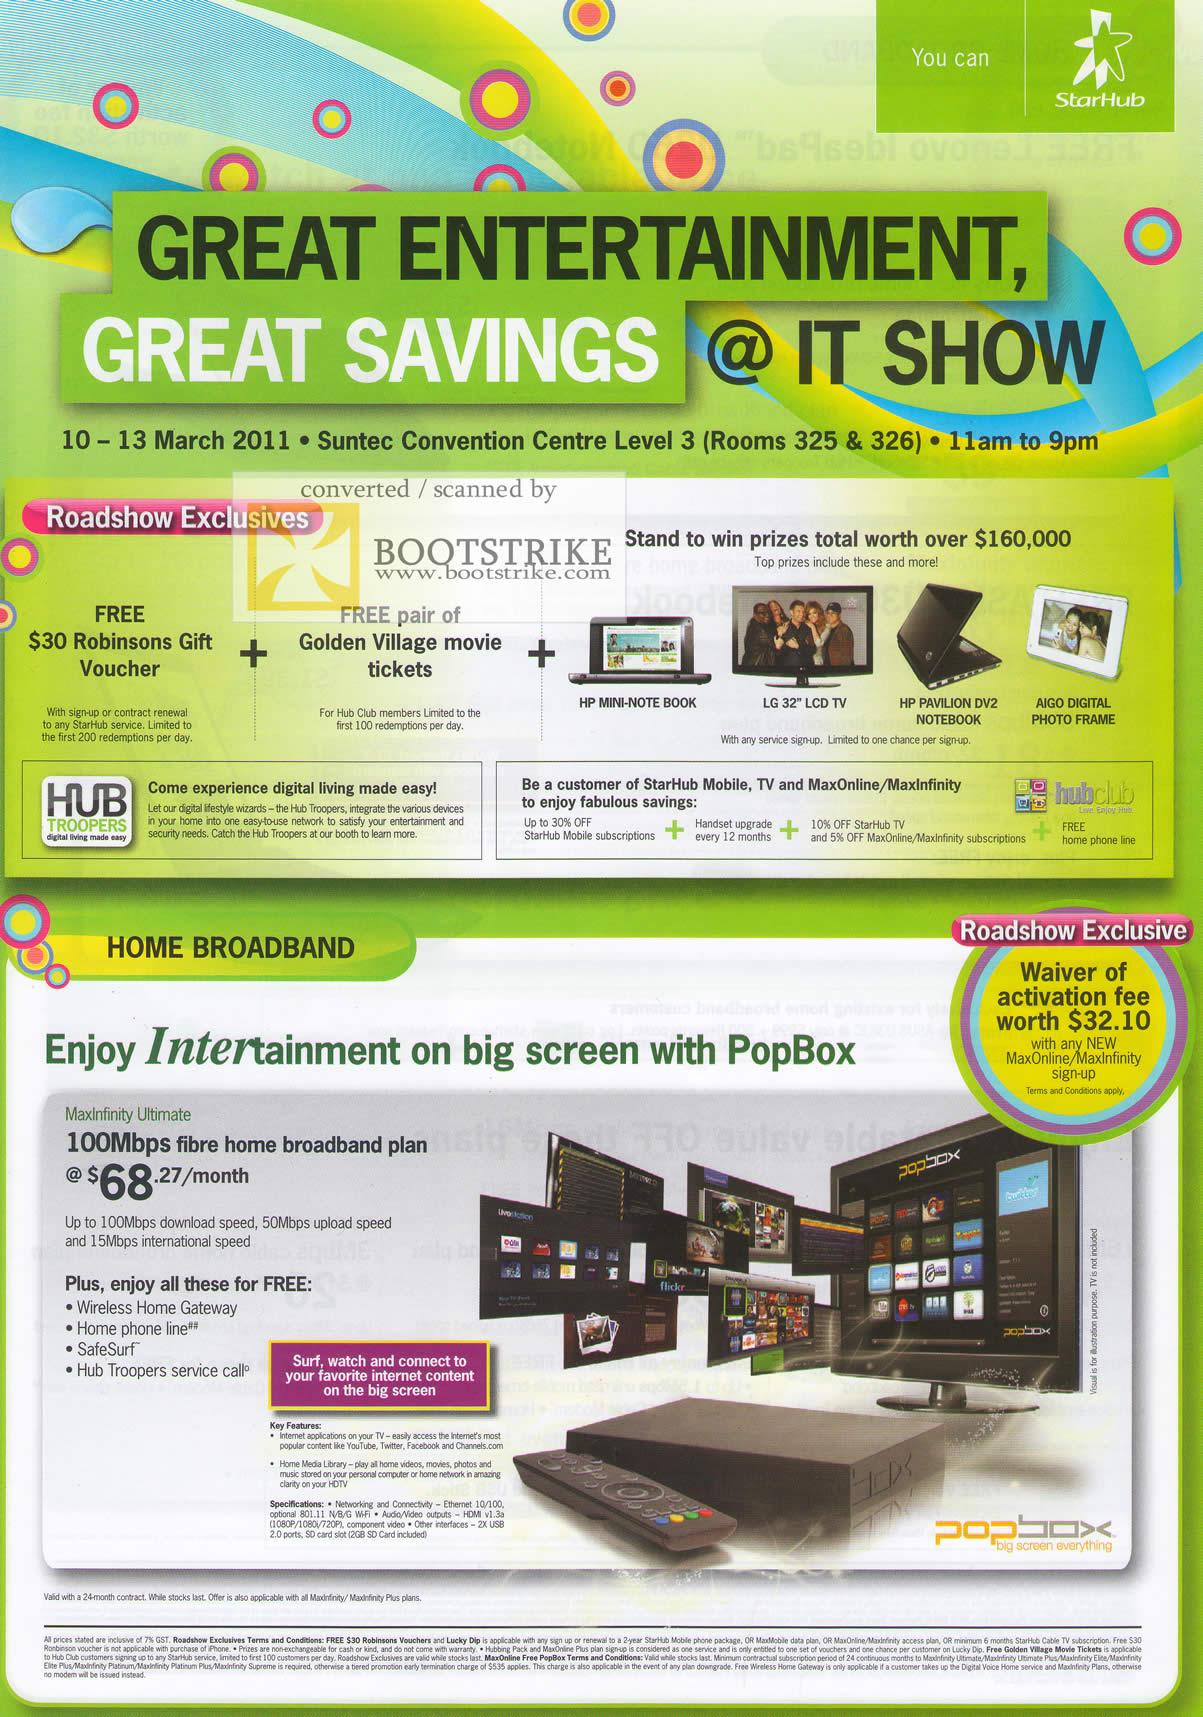 IT Show 2011 price list image brochure of Starhub Roadshow Exclusives Home Broadband PopBox Intertainment Fibre 100Mbps